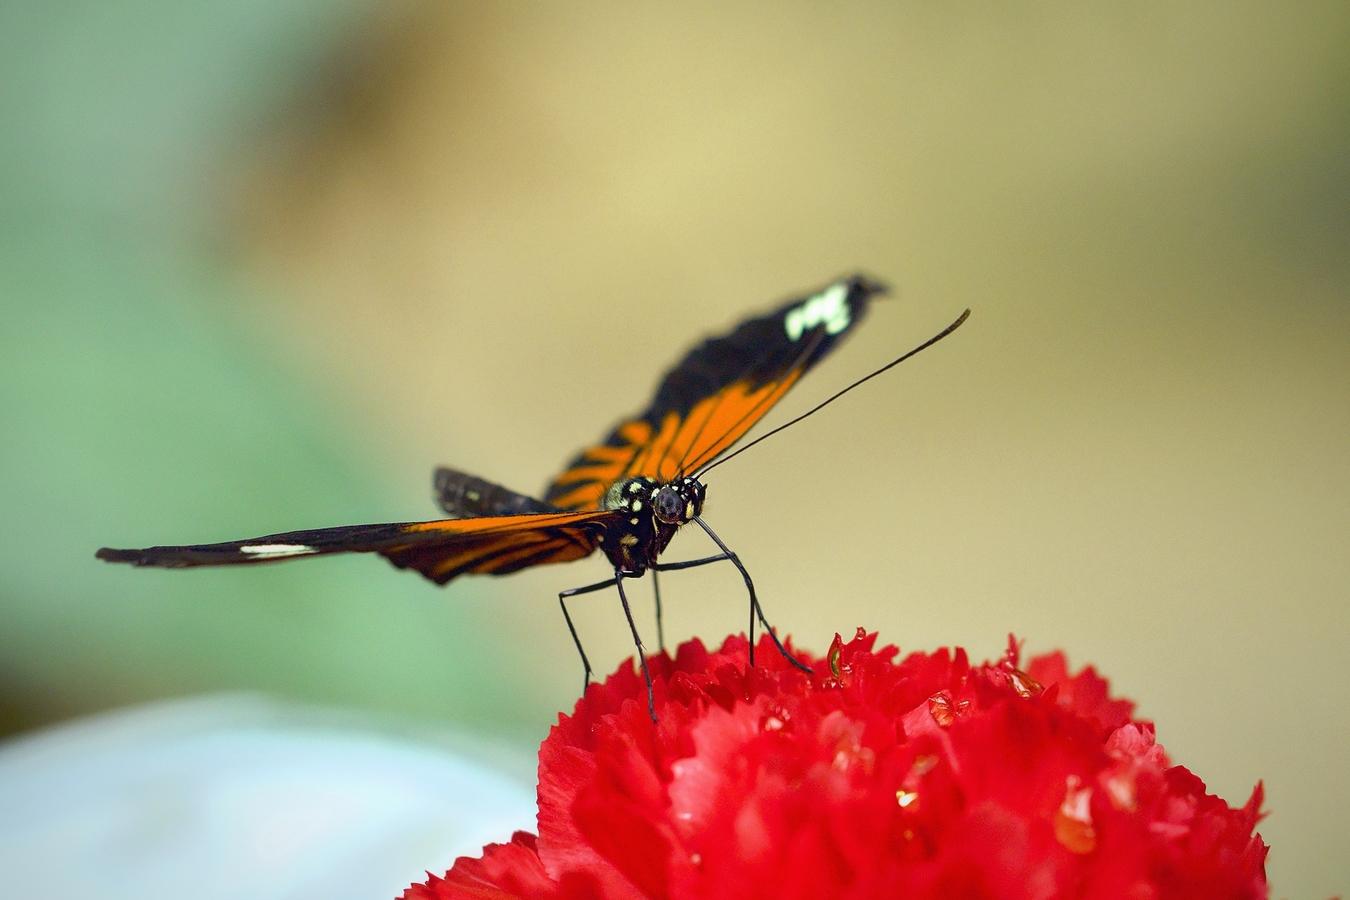 Karafiát s motýlem